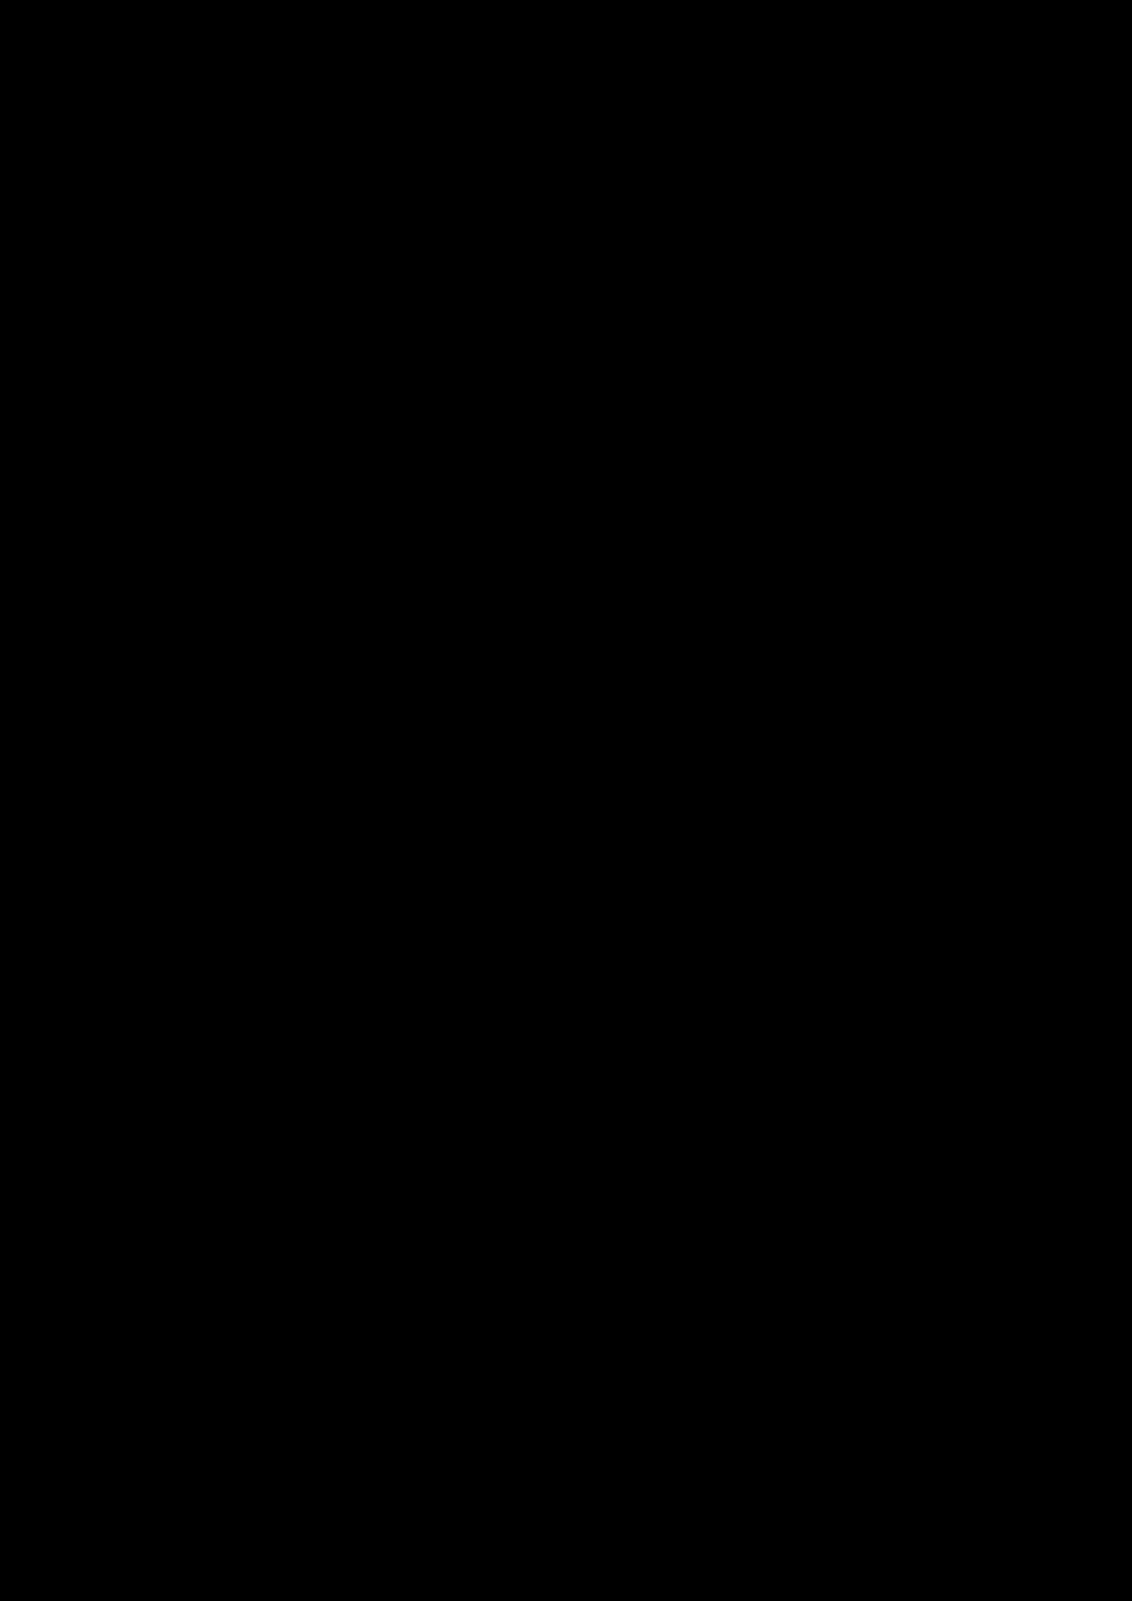 Ten lyubvi slide, Image 13